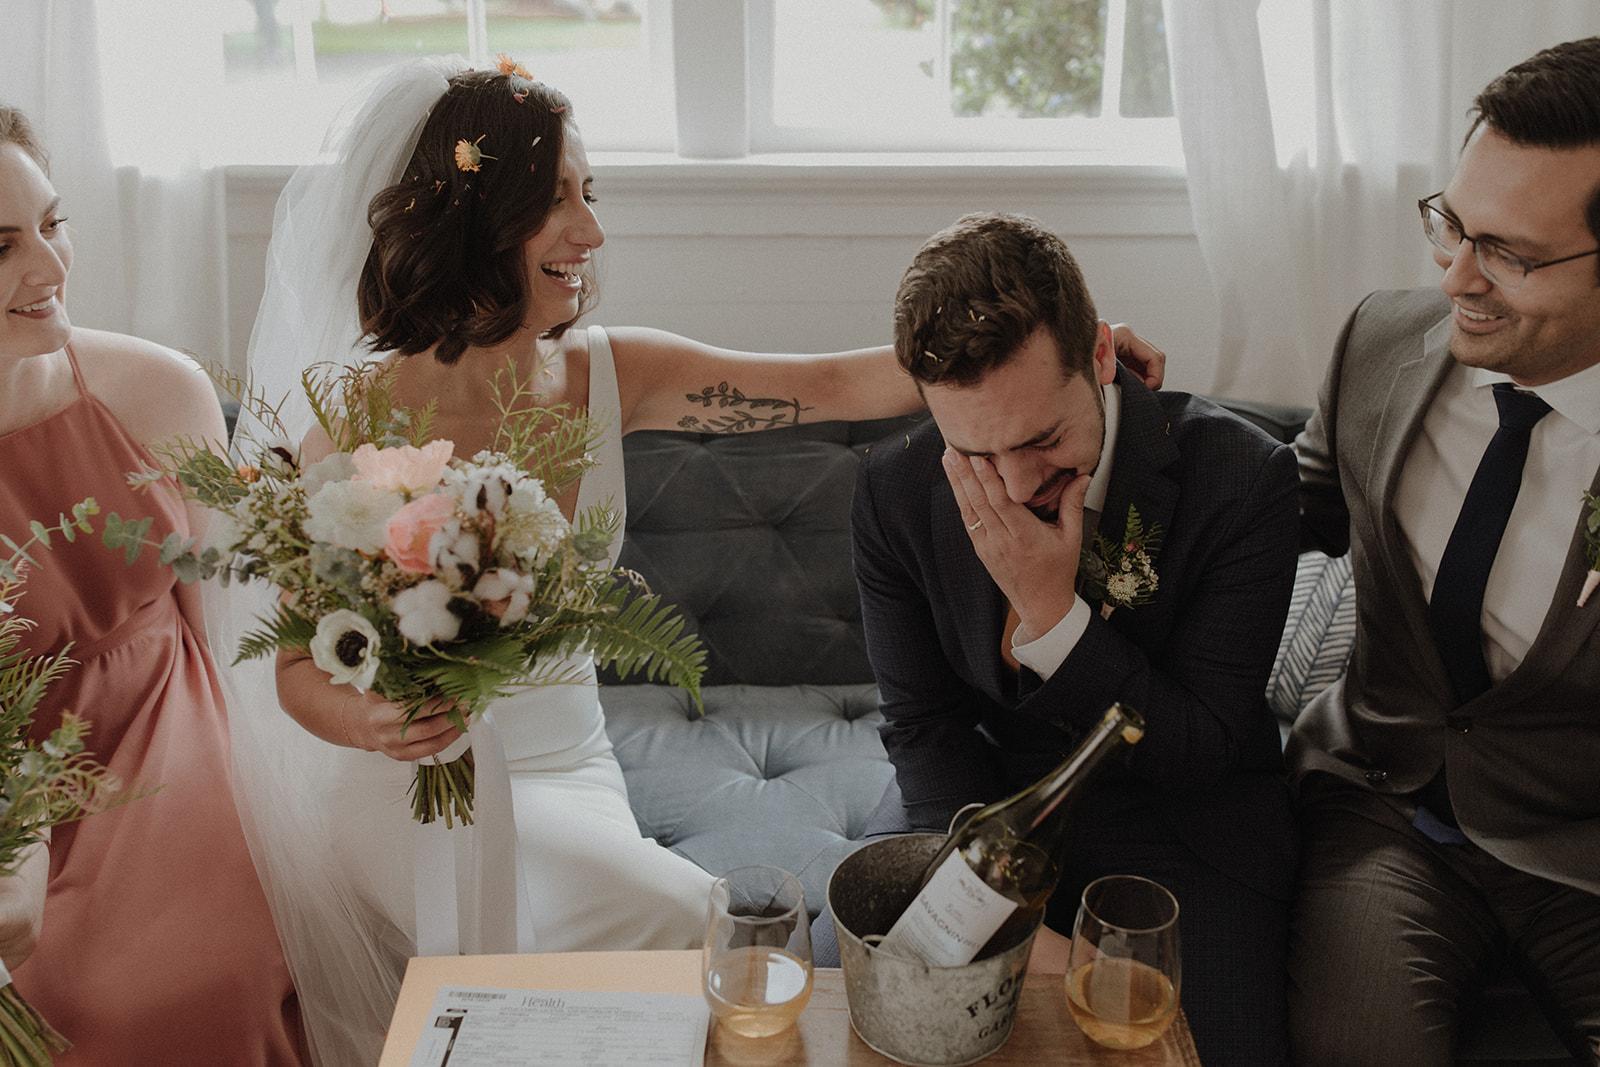 cortney_skye_wedding_june2019-471.jpg